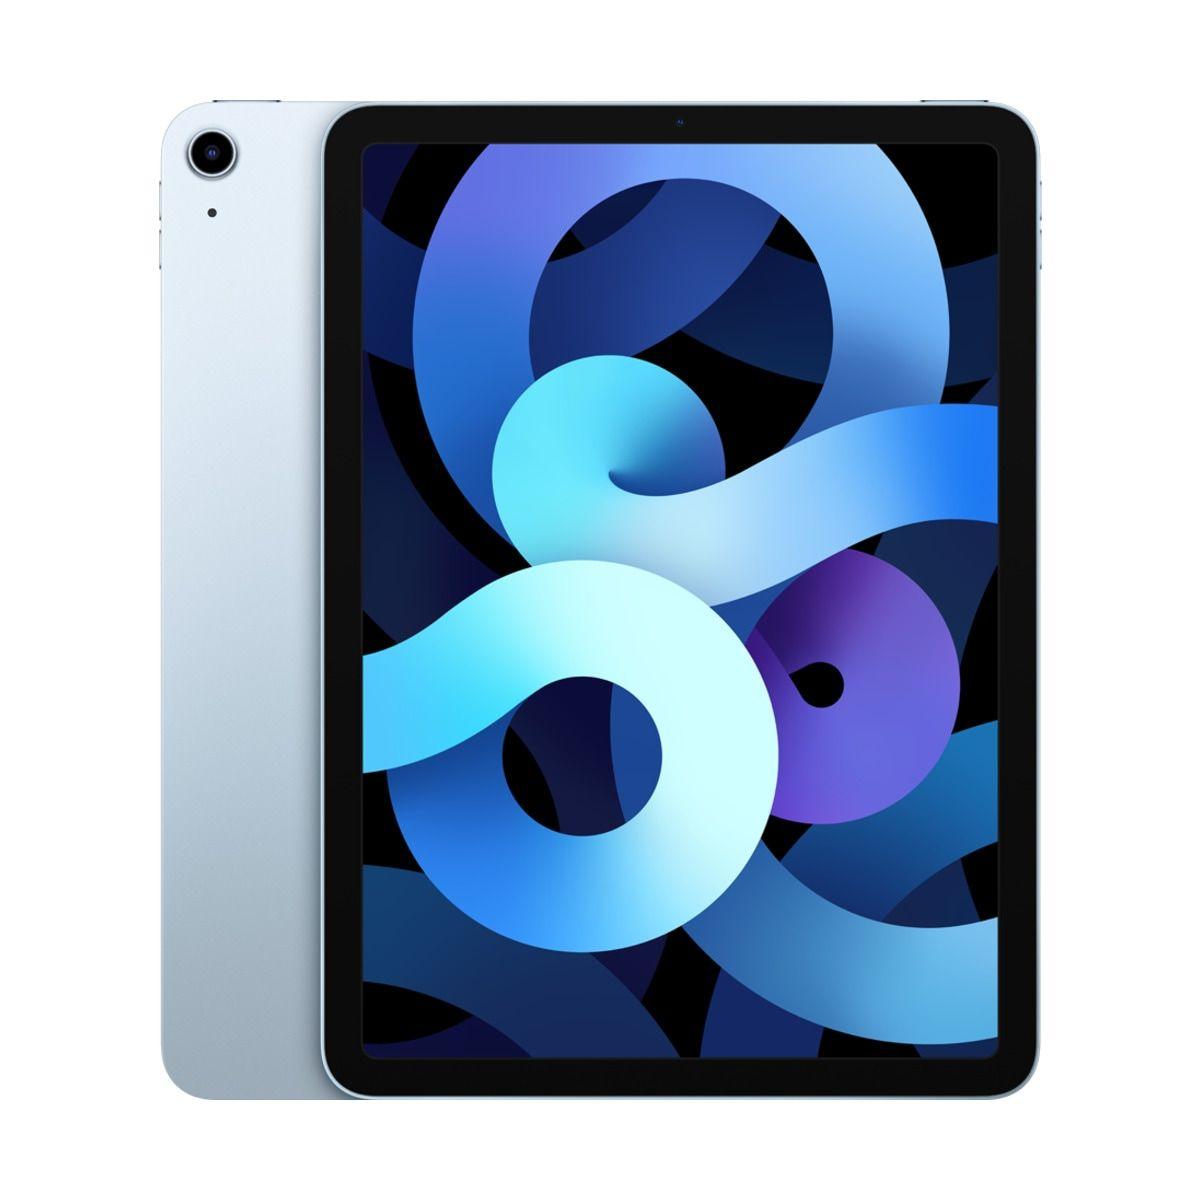 Apple iPad Air Wi-Fi+Cell 64GB - Sky Blue